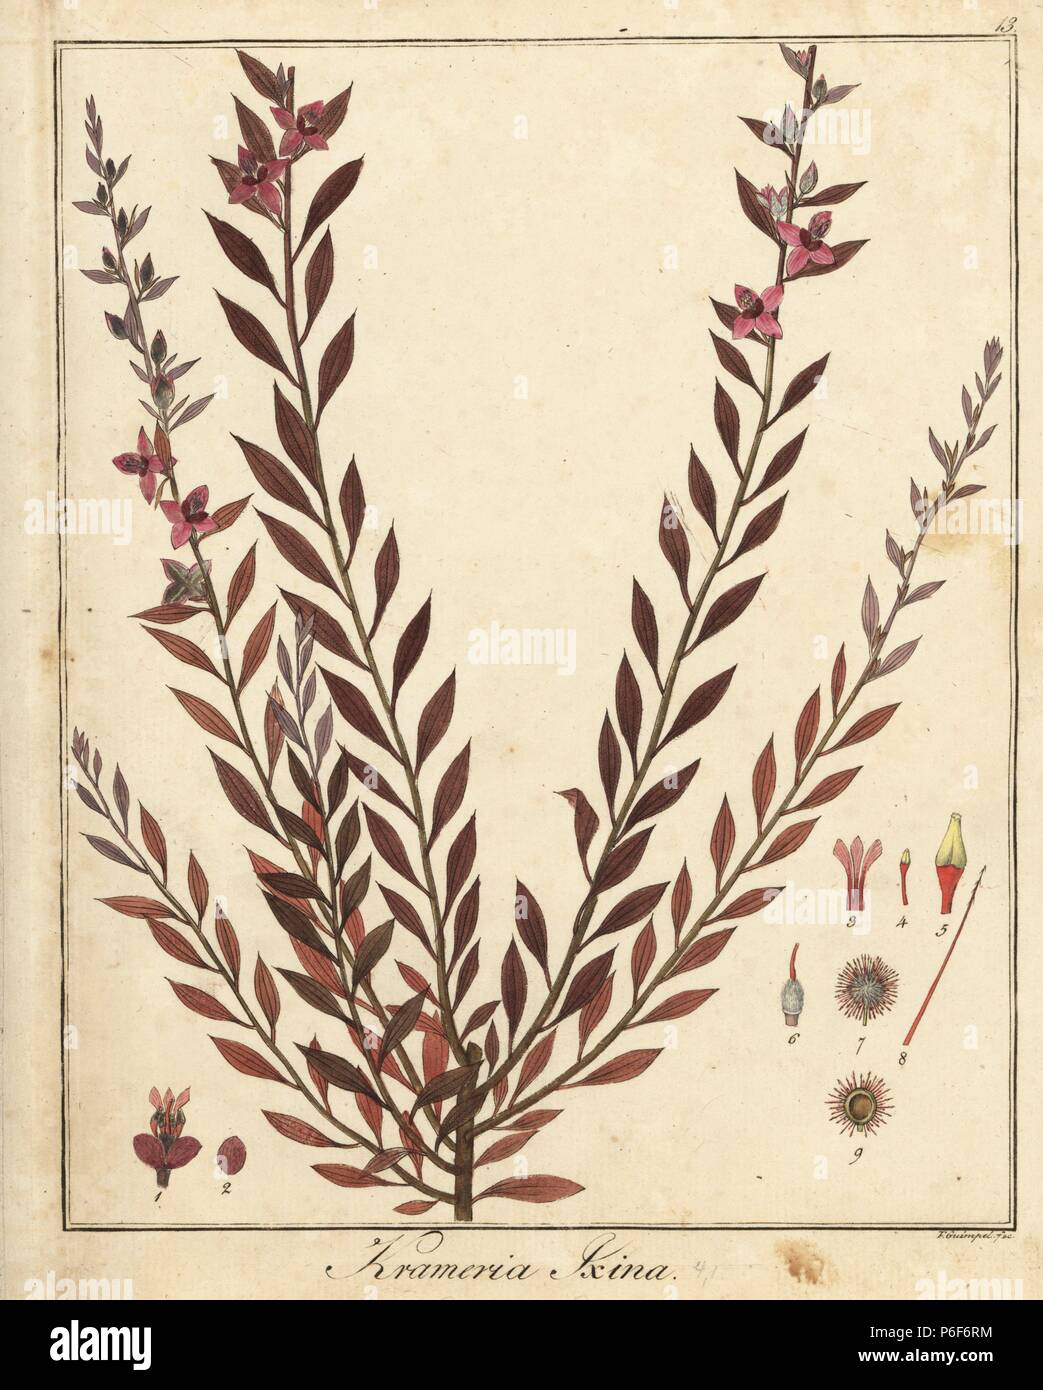 Abrojo Colorado Krameria Ixine Handcoloured Copperplate Engraving By F Guimpel From Dr Friedrich Gottlob Haynes Medical Botany Berlin 1822